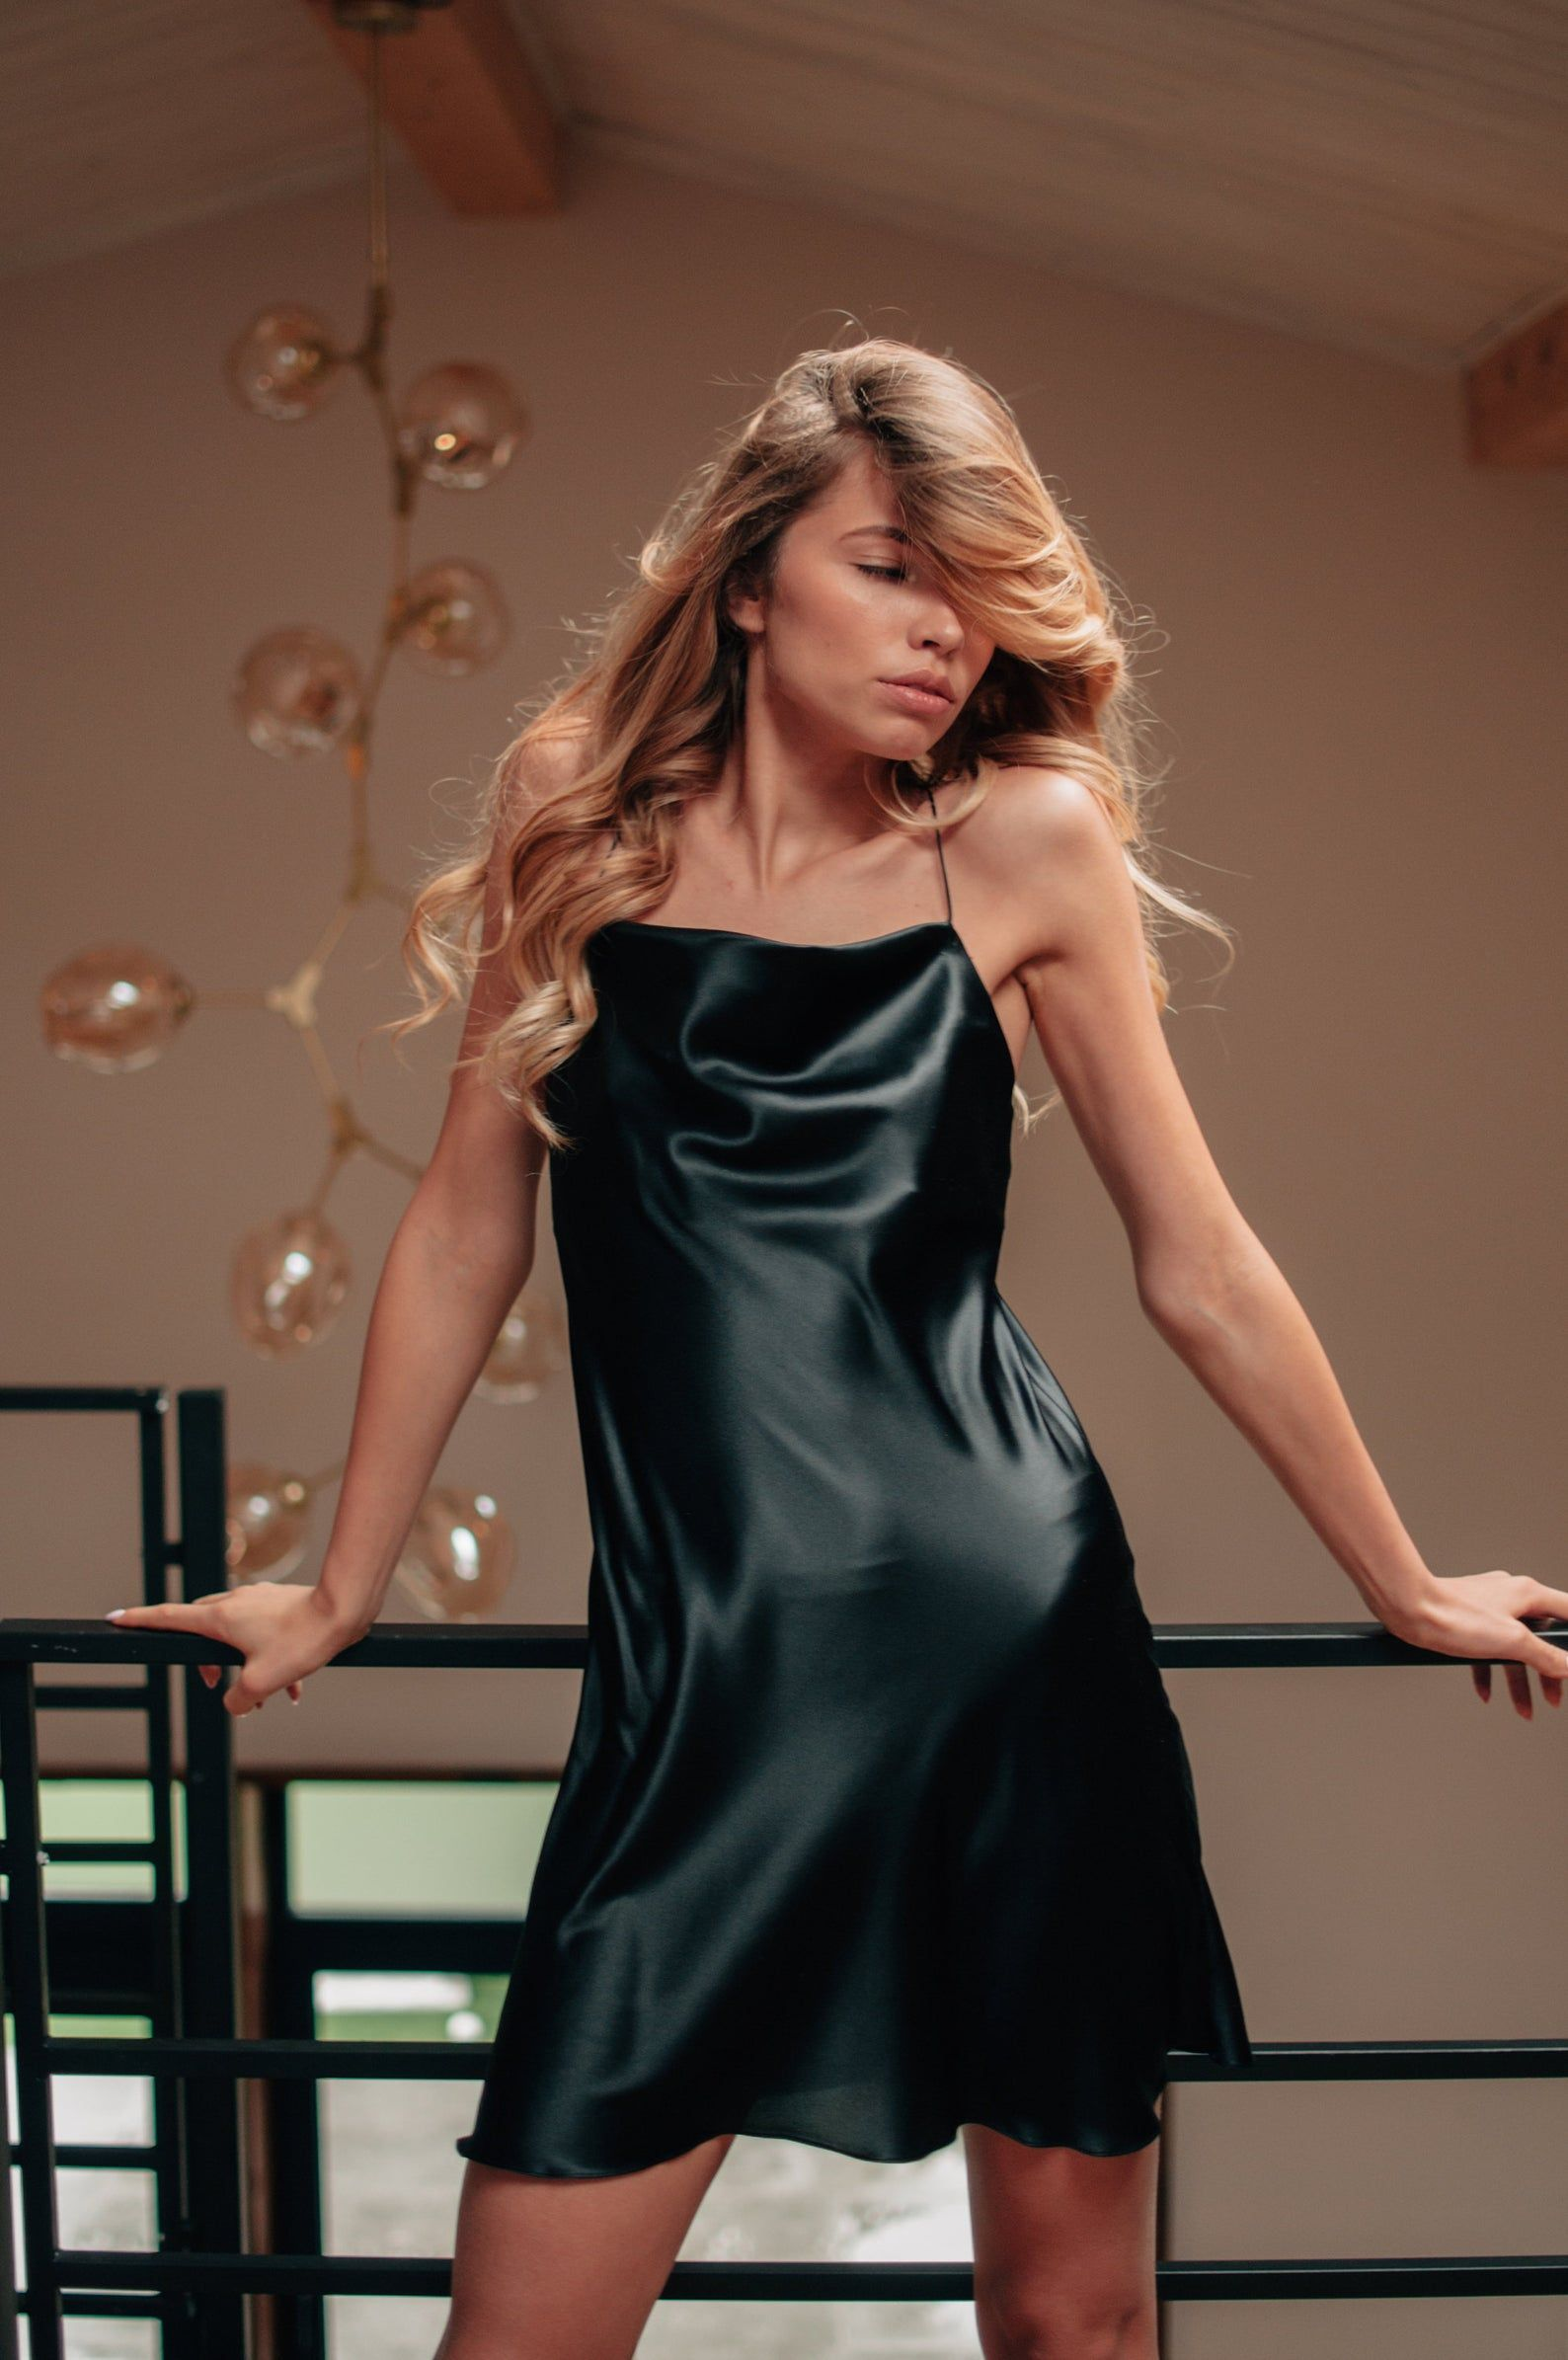 Short Silk Dress Short Black Slip Dress Silk Cami Dress Black Etsy In 2020 Silk Dress Short Silk Slip Dress Black Slip Dress